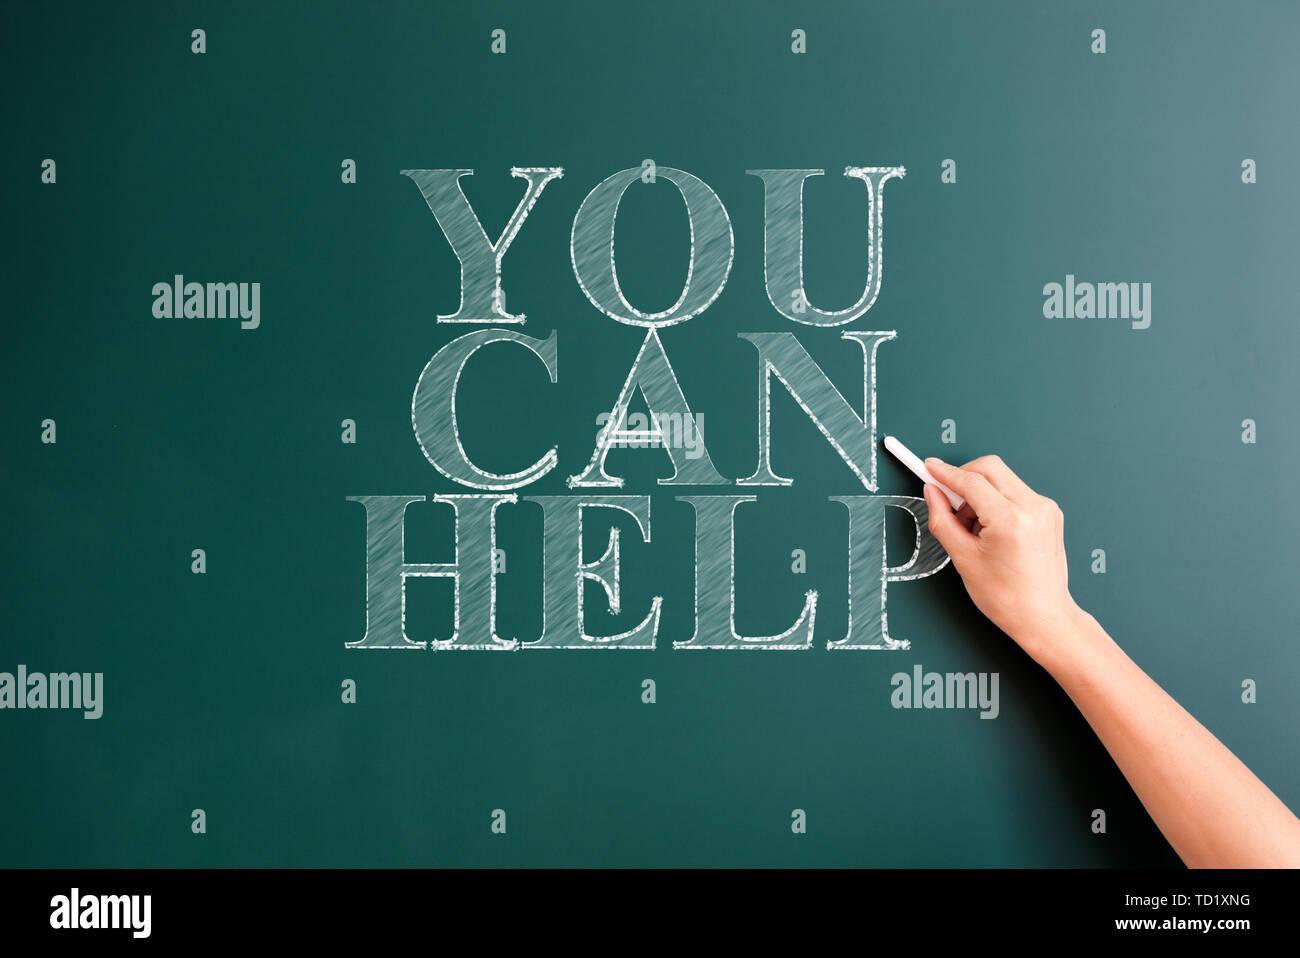 you can help written on blackboard - Stock Image